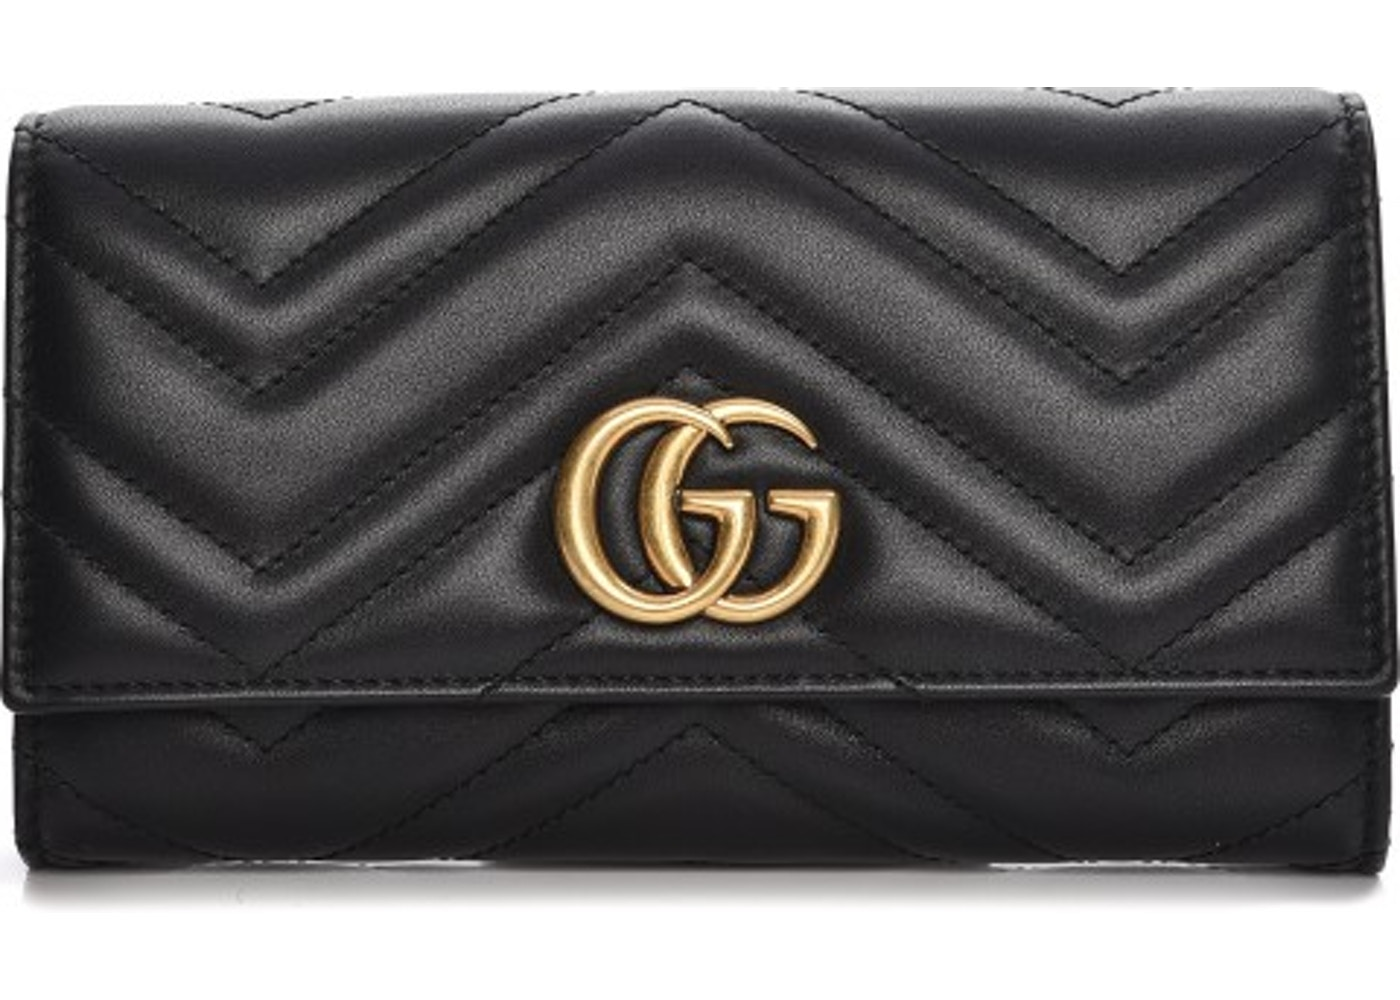 fe0df890a72c02 Gucci Continental Wallet Marmont Matelasse GG Black